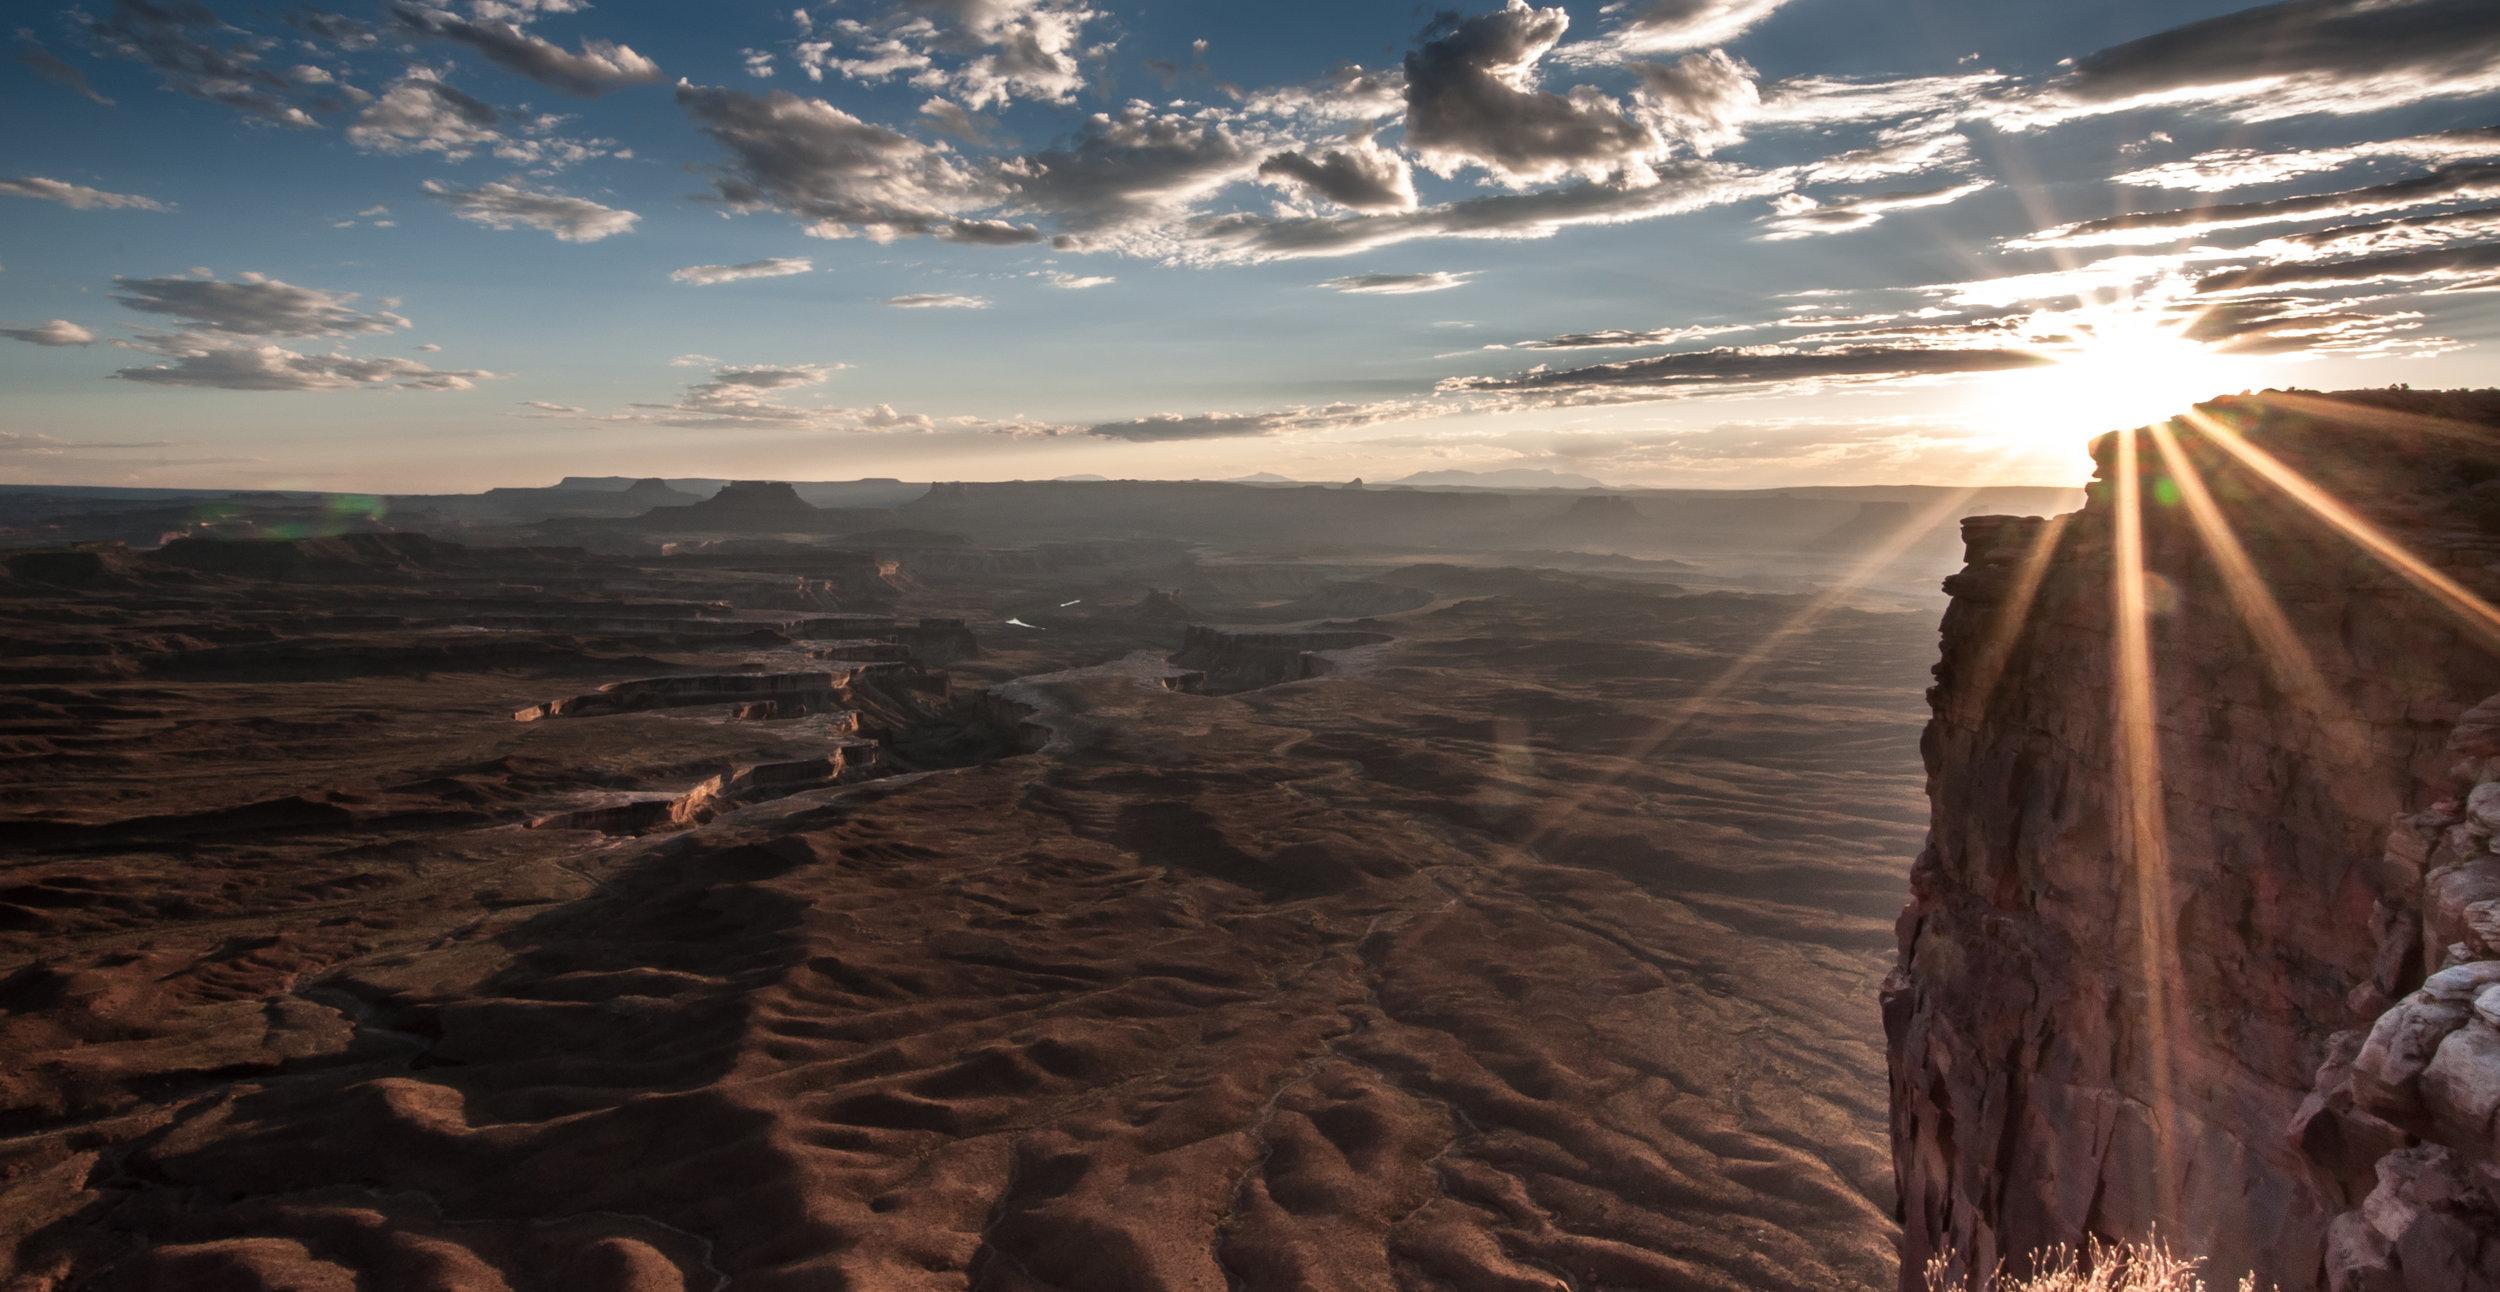 140914. CanyonlandsNP (144).jpg